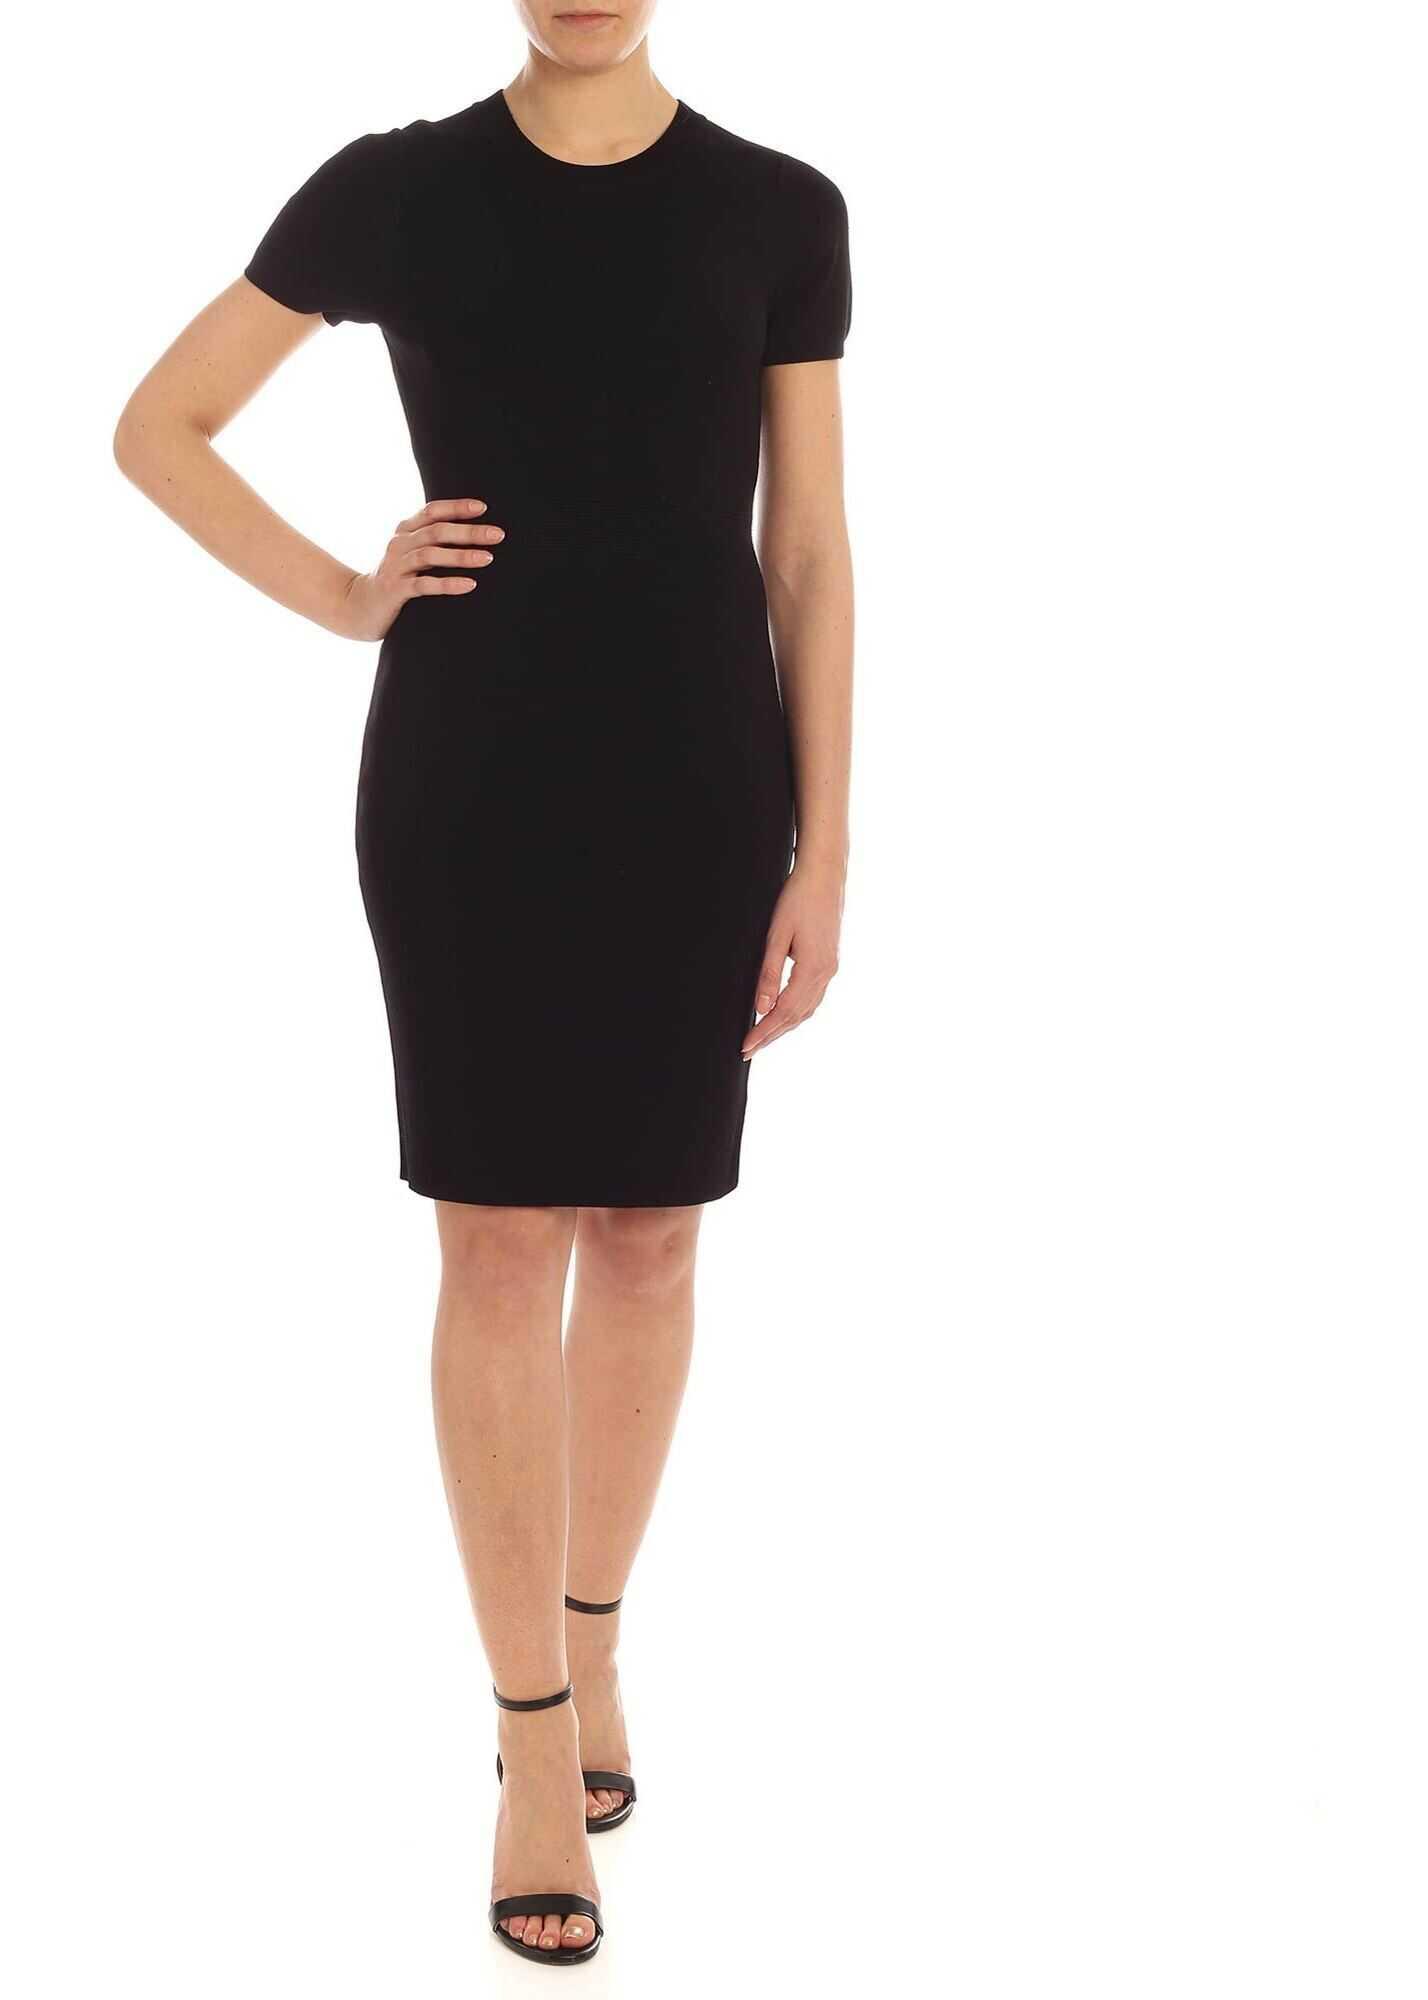 Michael Kors Knitted Pencil Dress In Black Black